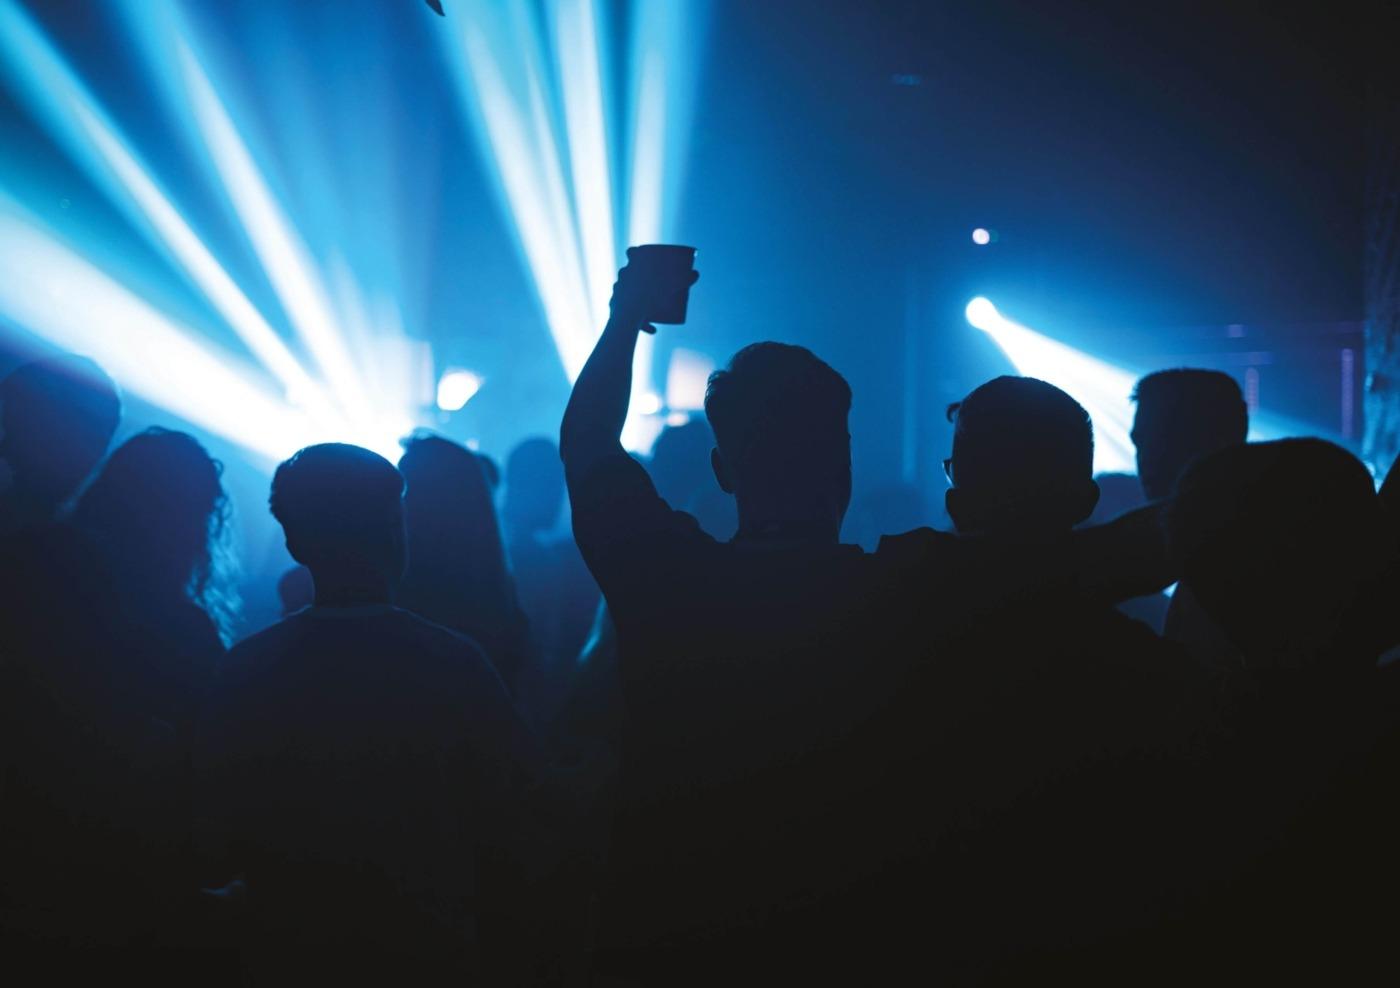 Clubbing / Image: Unsplash